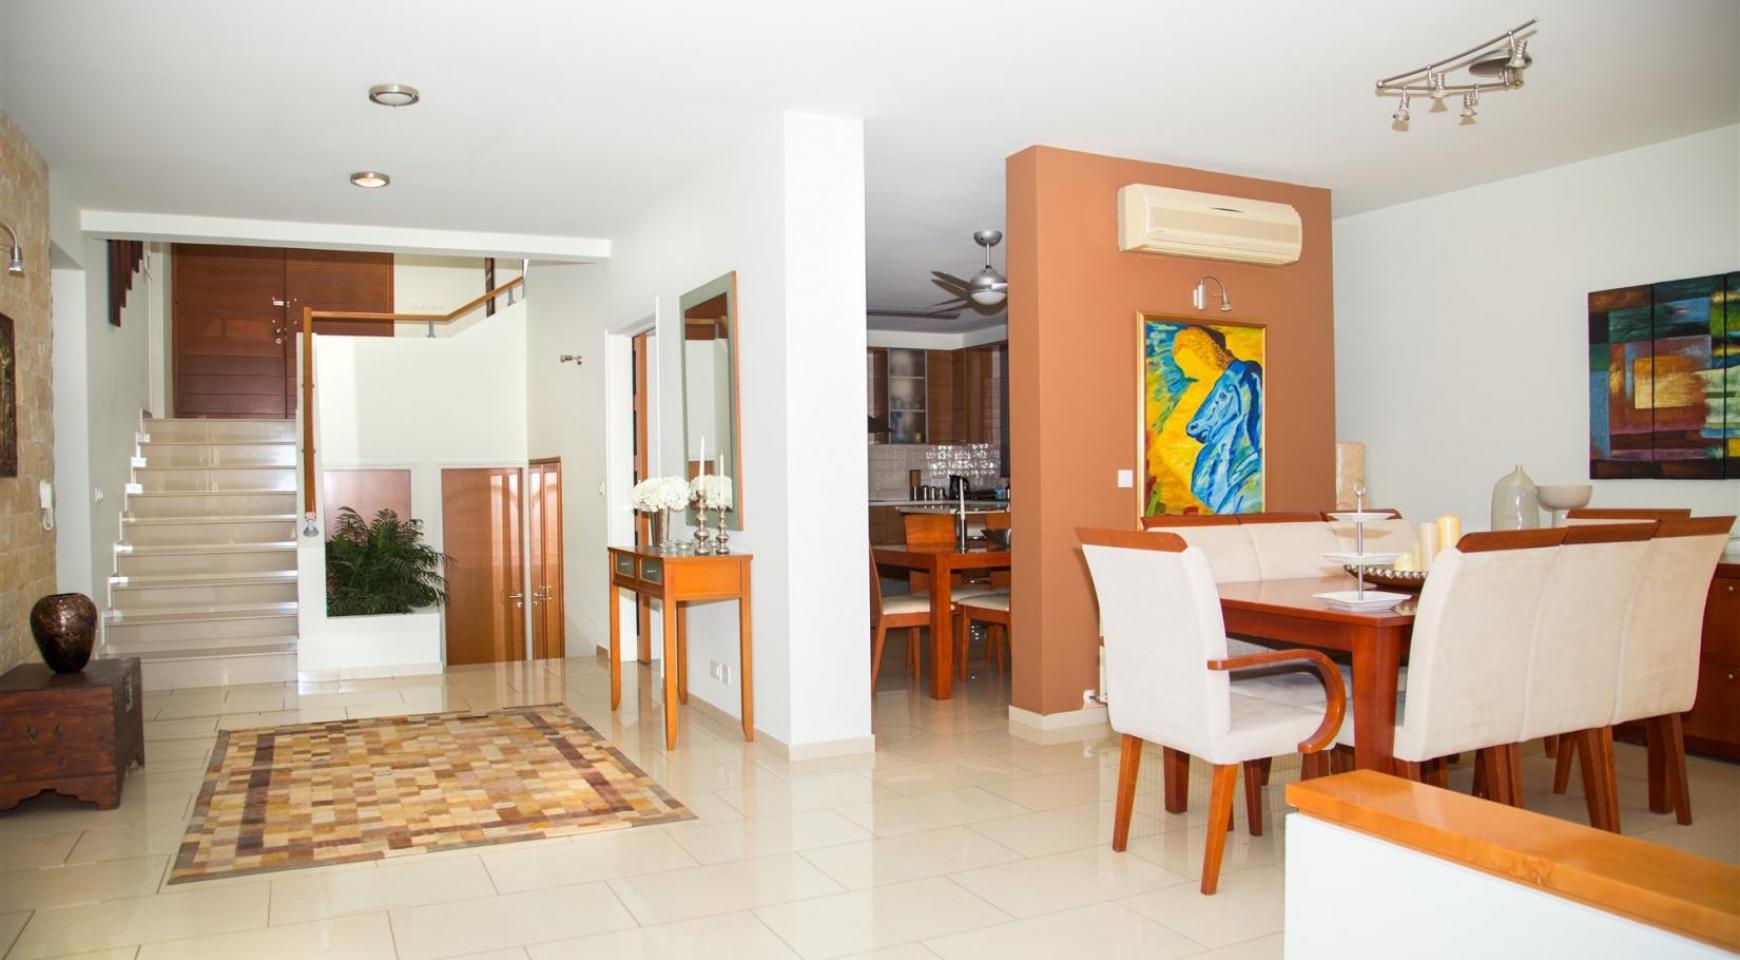 Modern Luxury 4 Bedroom Villa in Sfalagiotisa, Agios Athanasios - 18